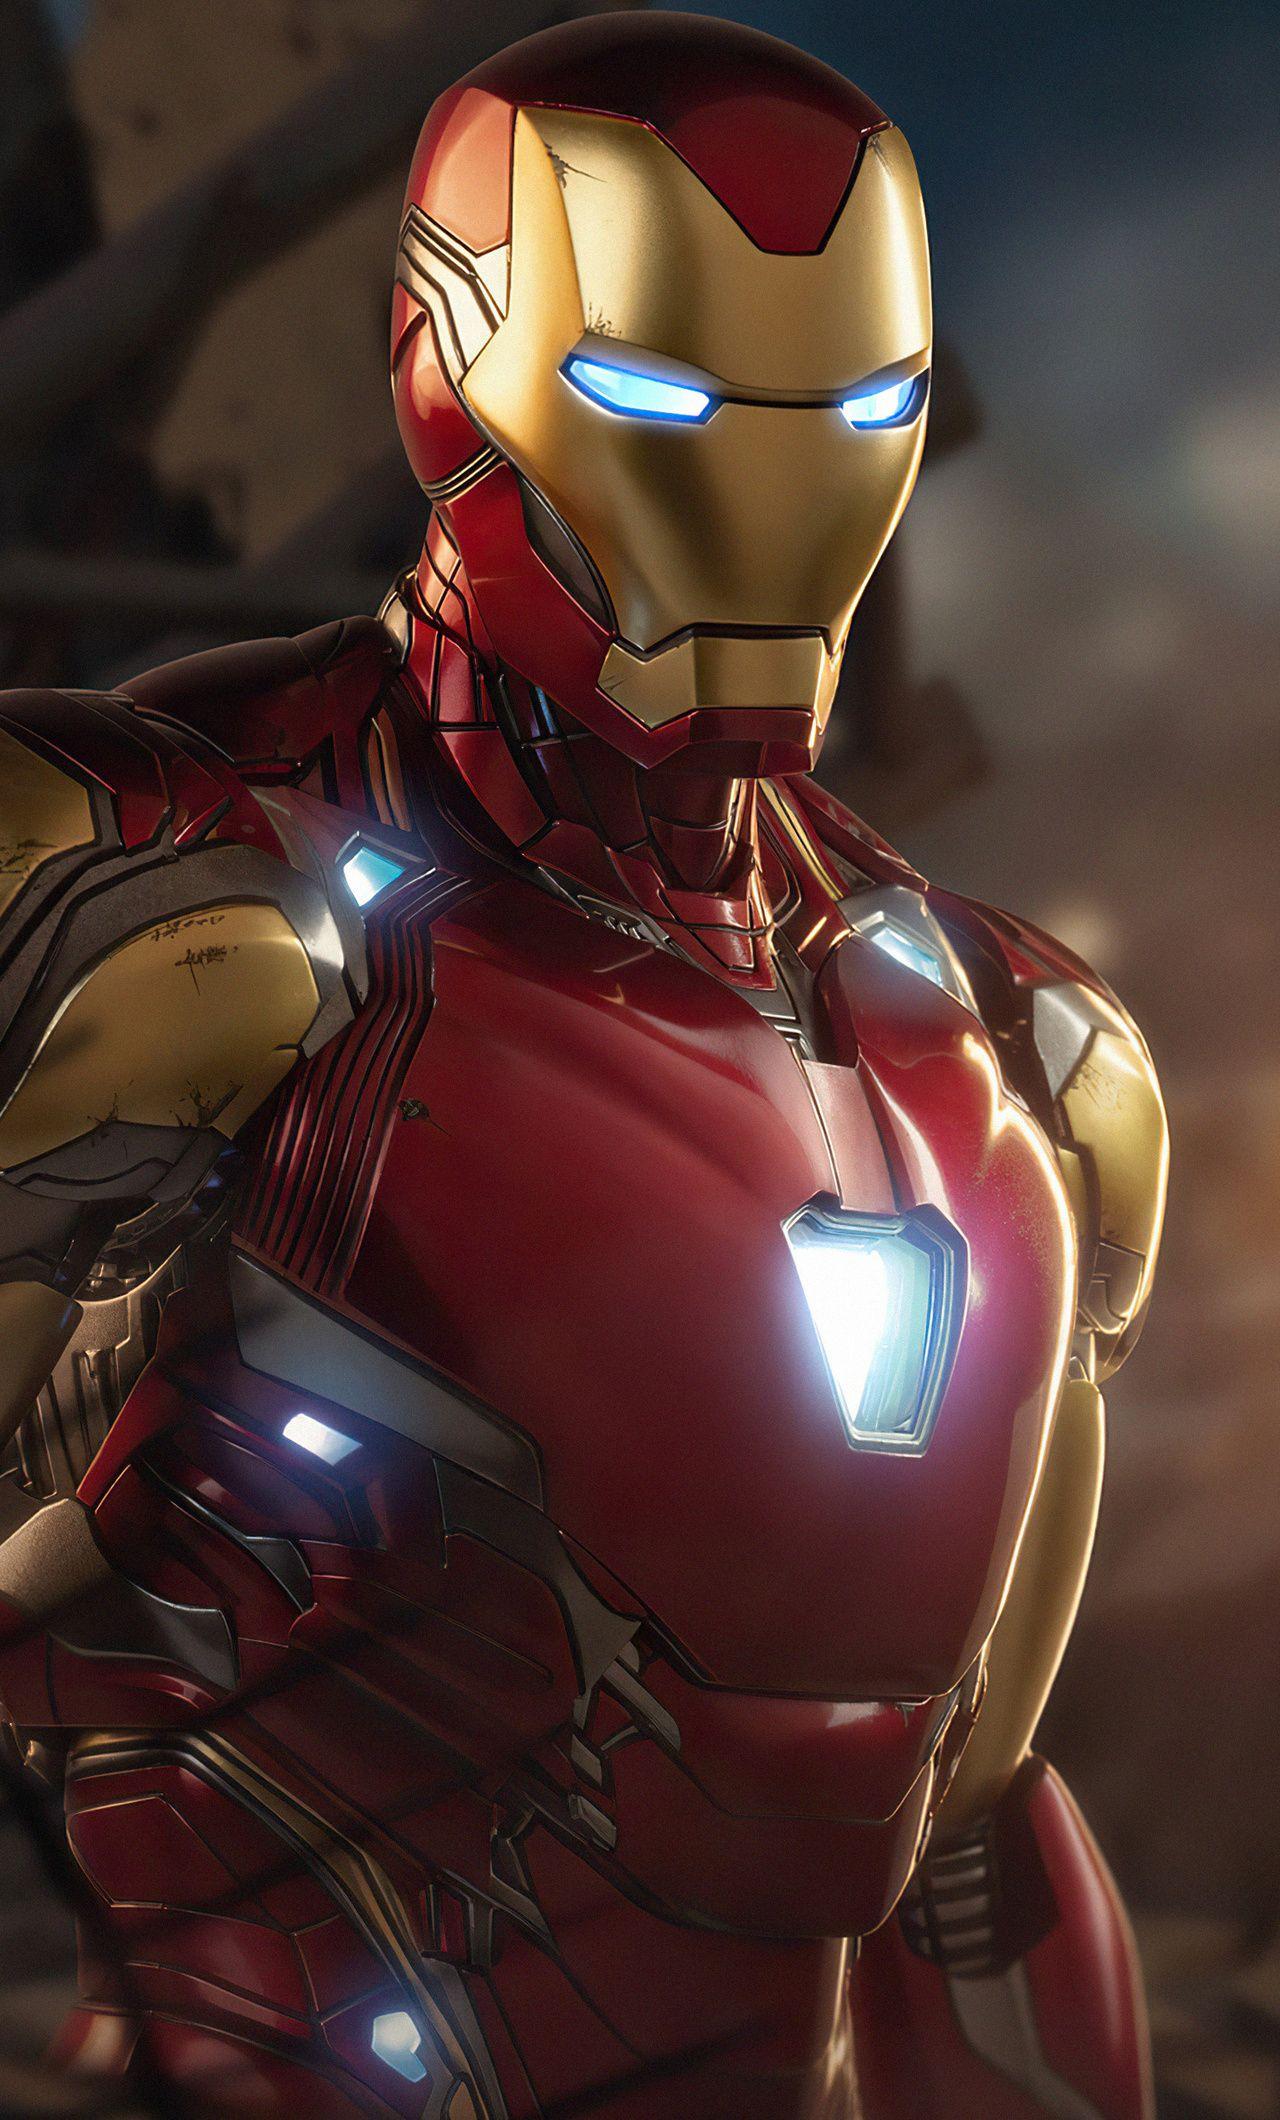 Iron Man Avengers 4 In 1280x2120 Resolution In 2021 Iron Man Avengers Iron Man Pictures Iron Man Get inspired for iron man hd wallpaper